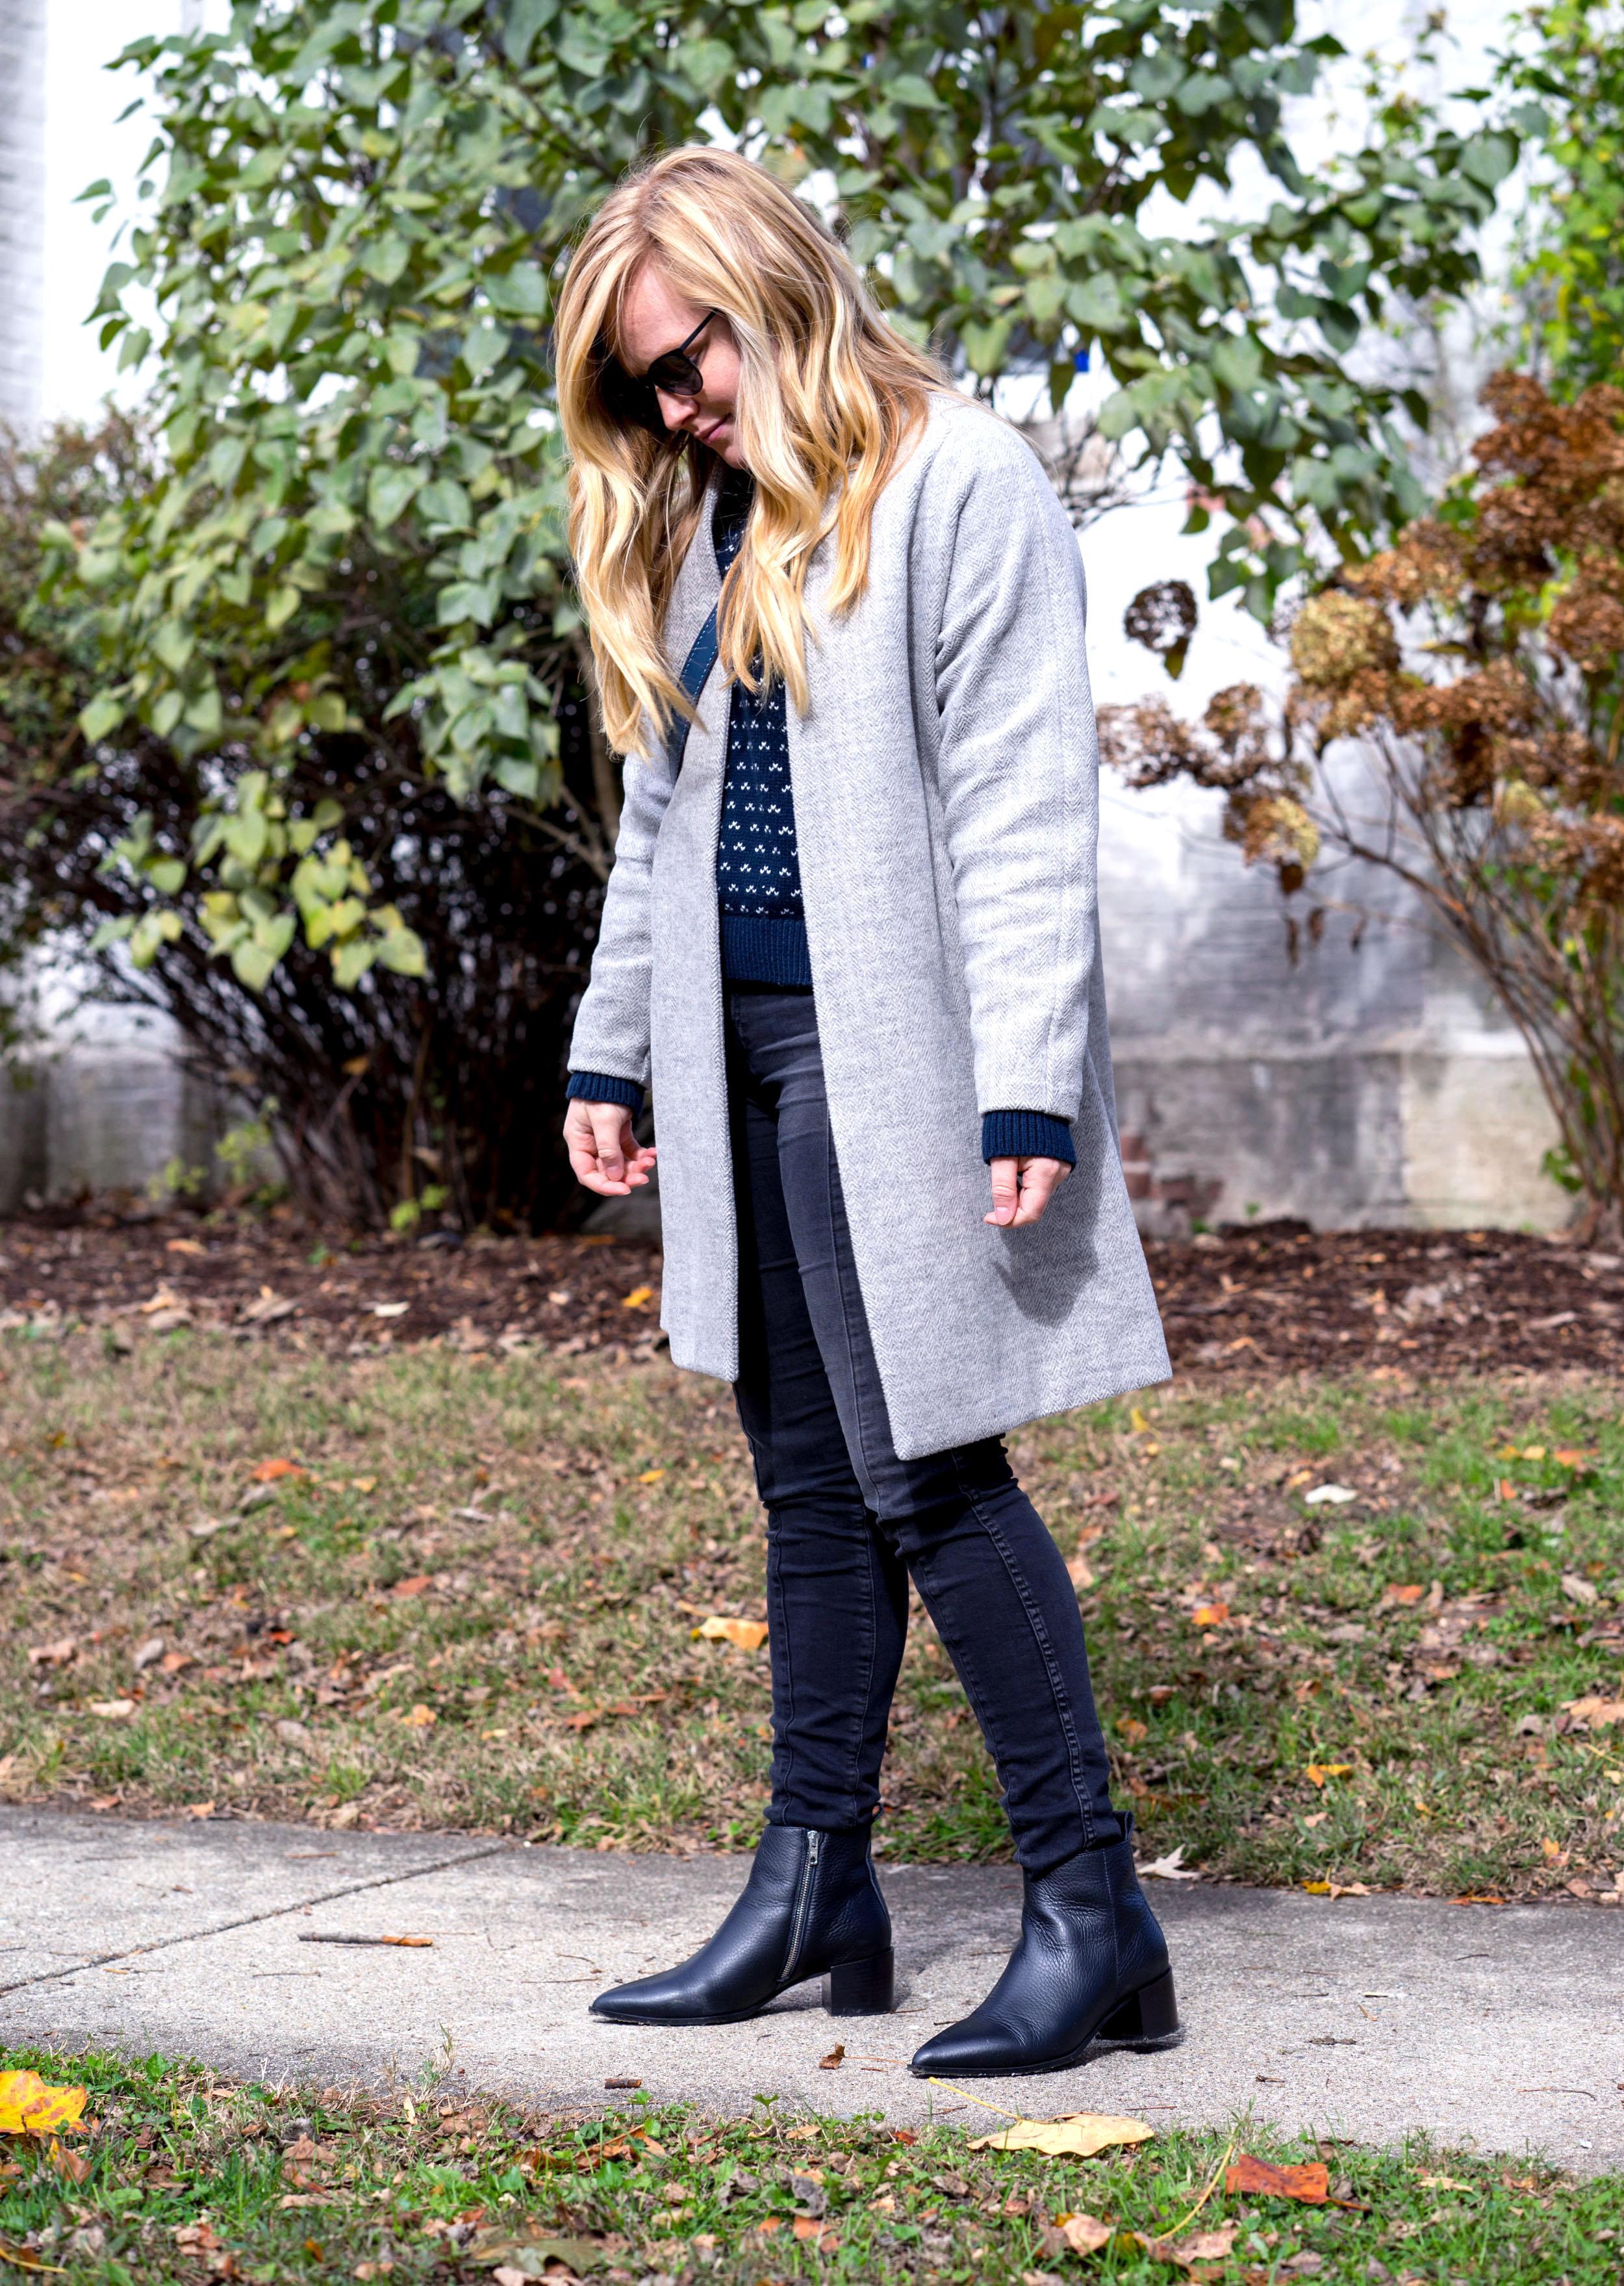 Maggie a la Mode - Most Popular Items 2018 Madewell Stanza Herringbone Coat